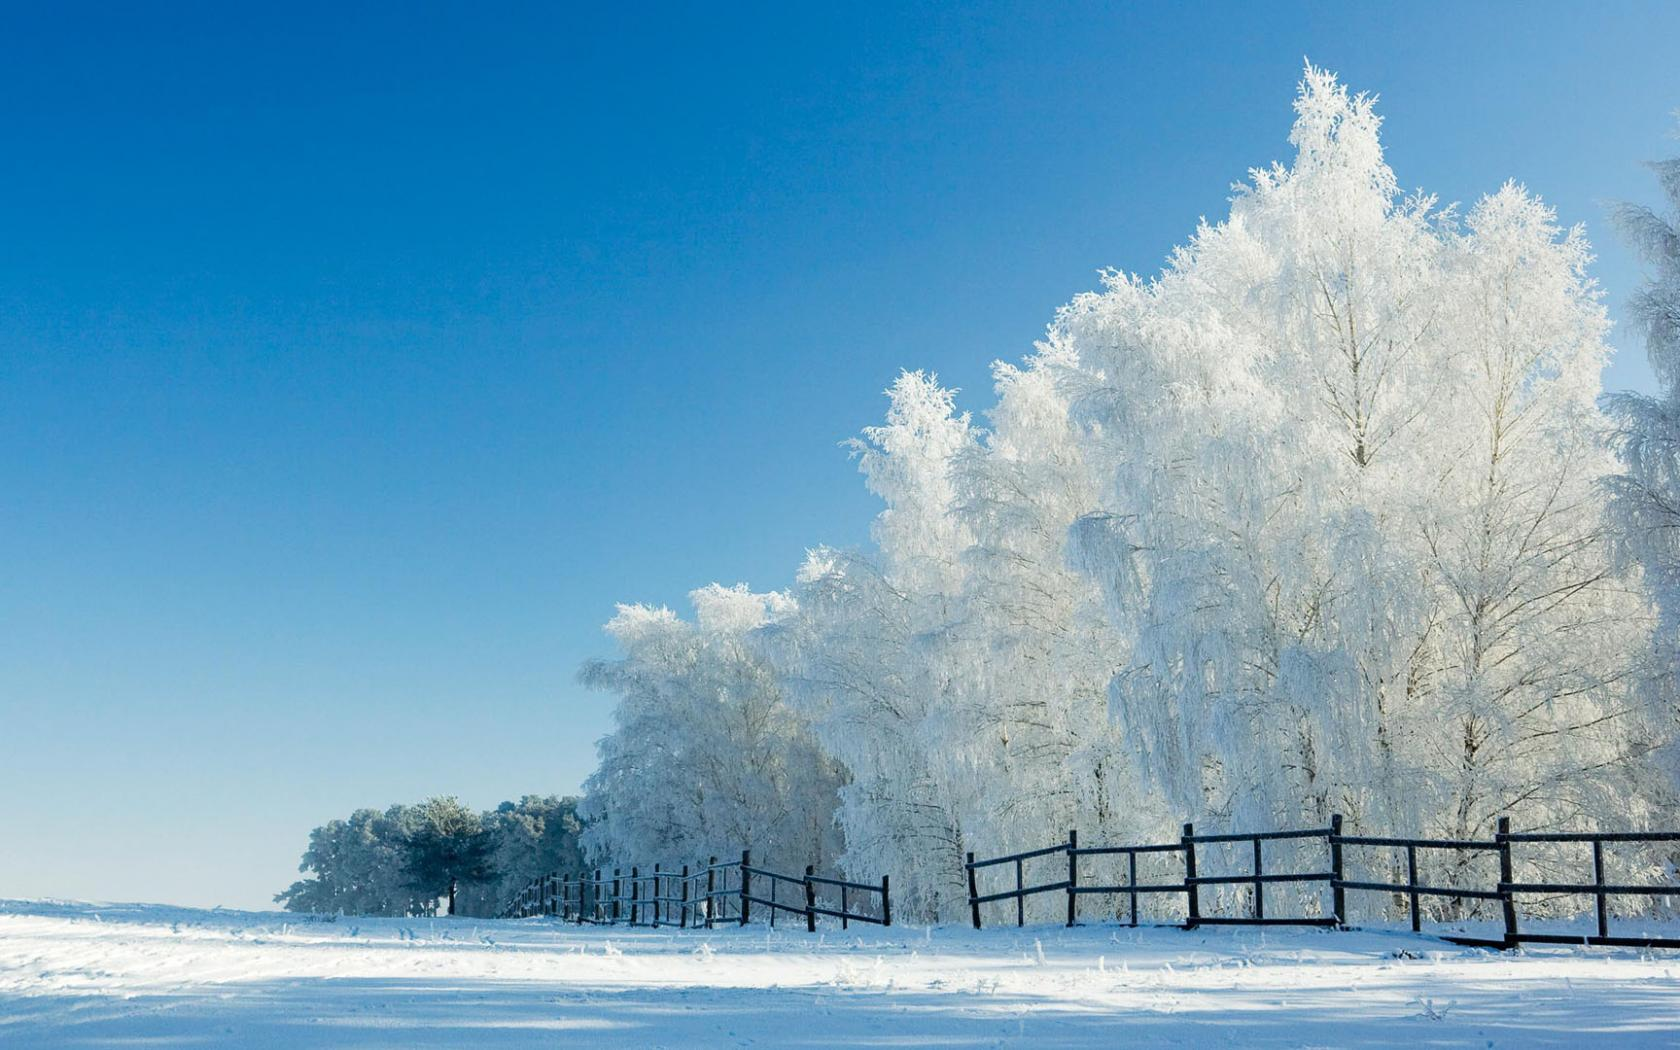 Snow Wallpaper Widescreen 8701 Hd Wallpapers in Nature   Imagescicom 1680x1050